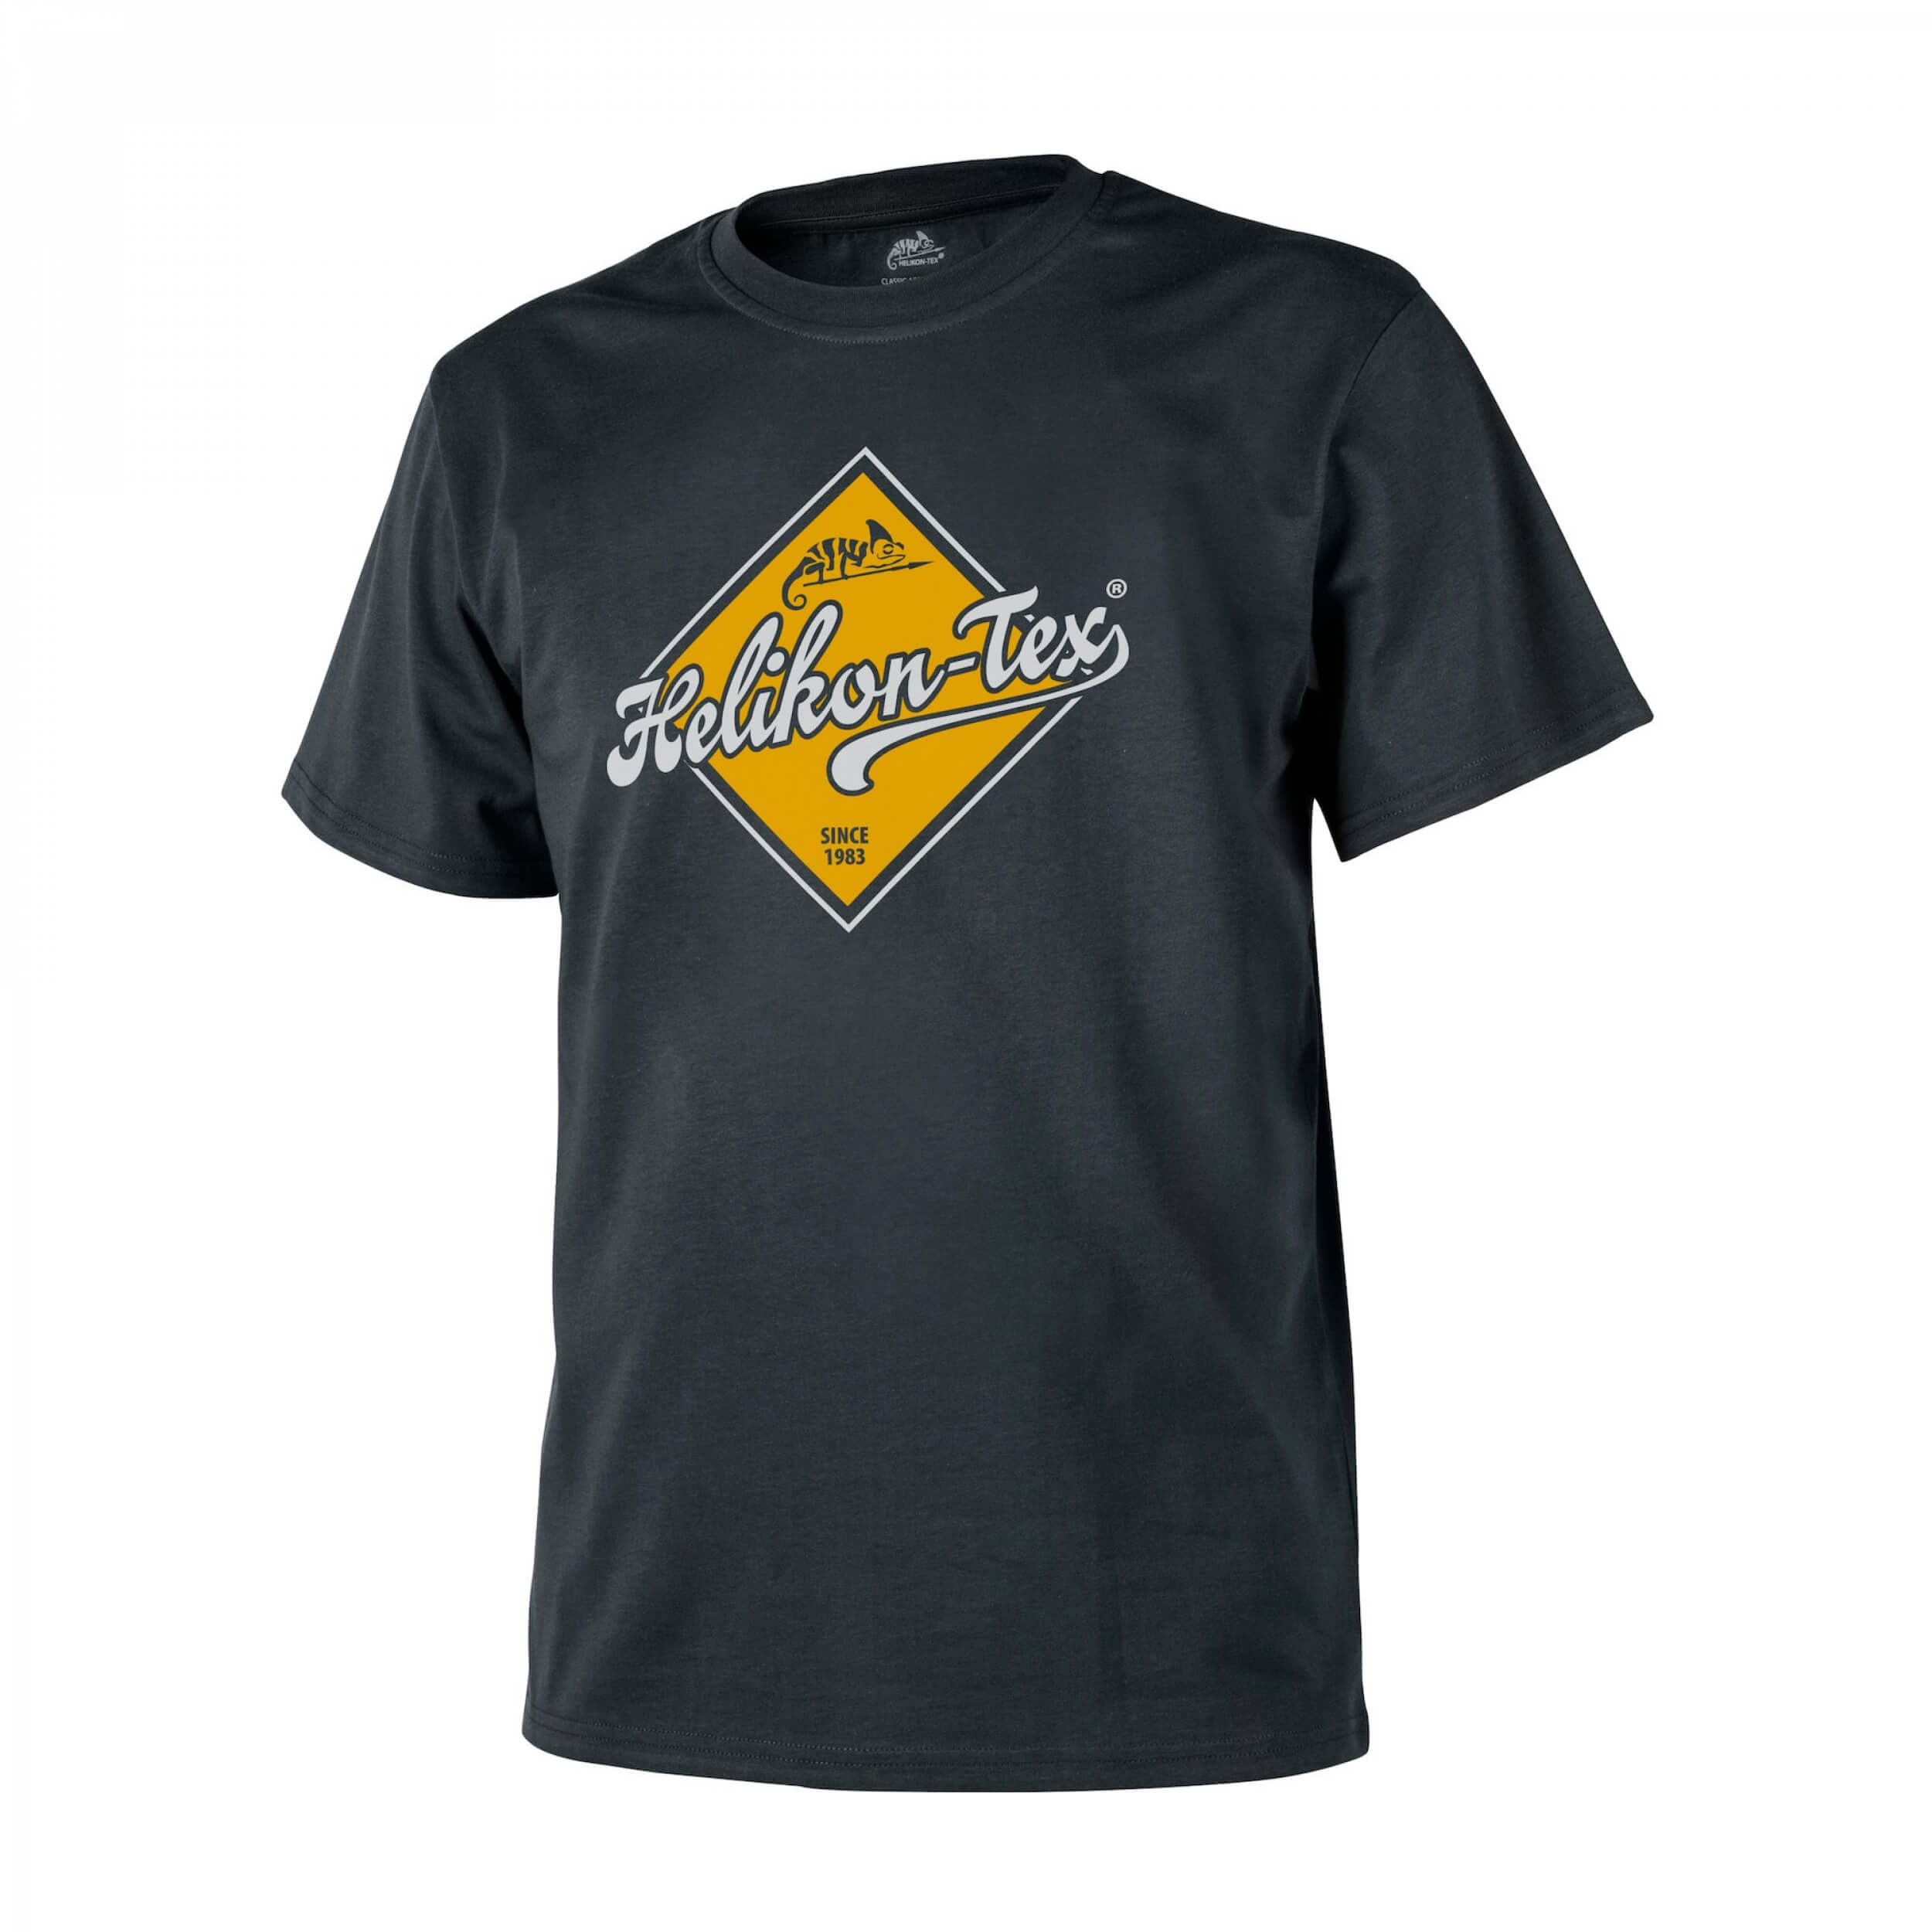 Helikon-Tex T-Shirt (Helikon-Tex Road Sign) -Cotton- Black